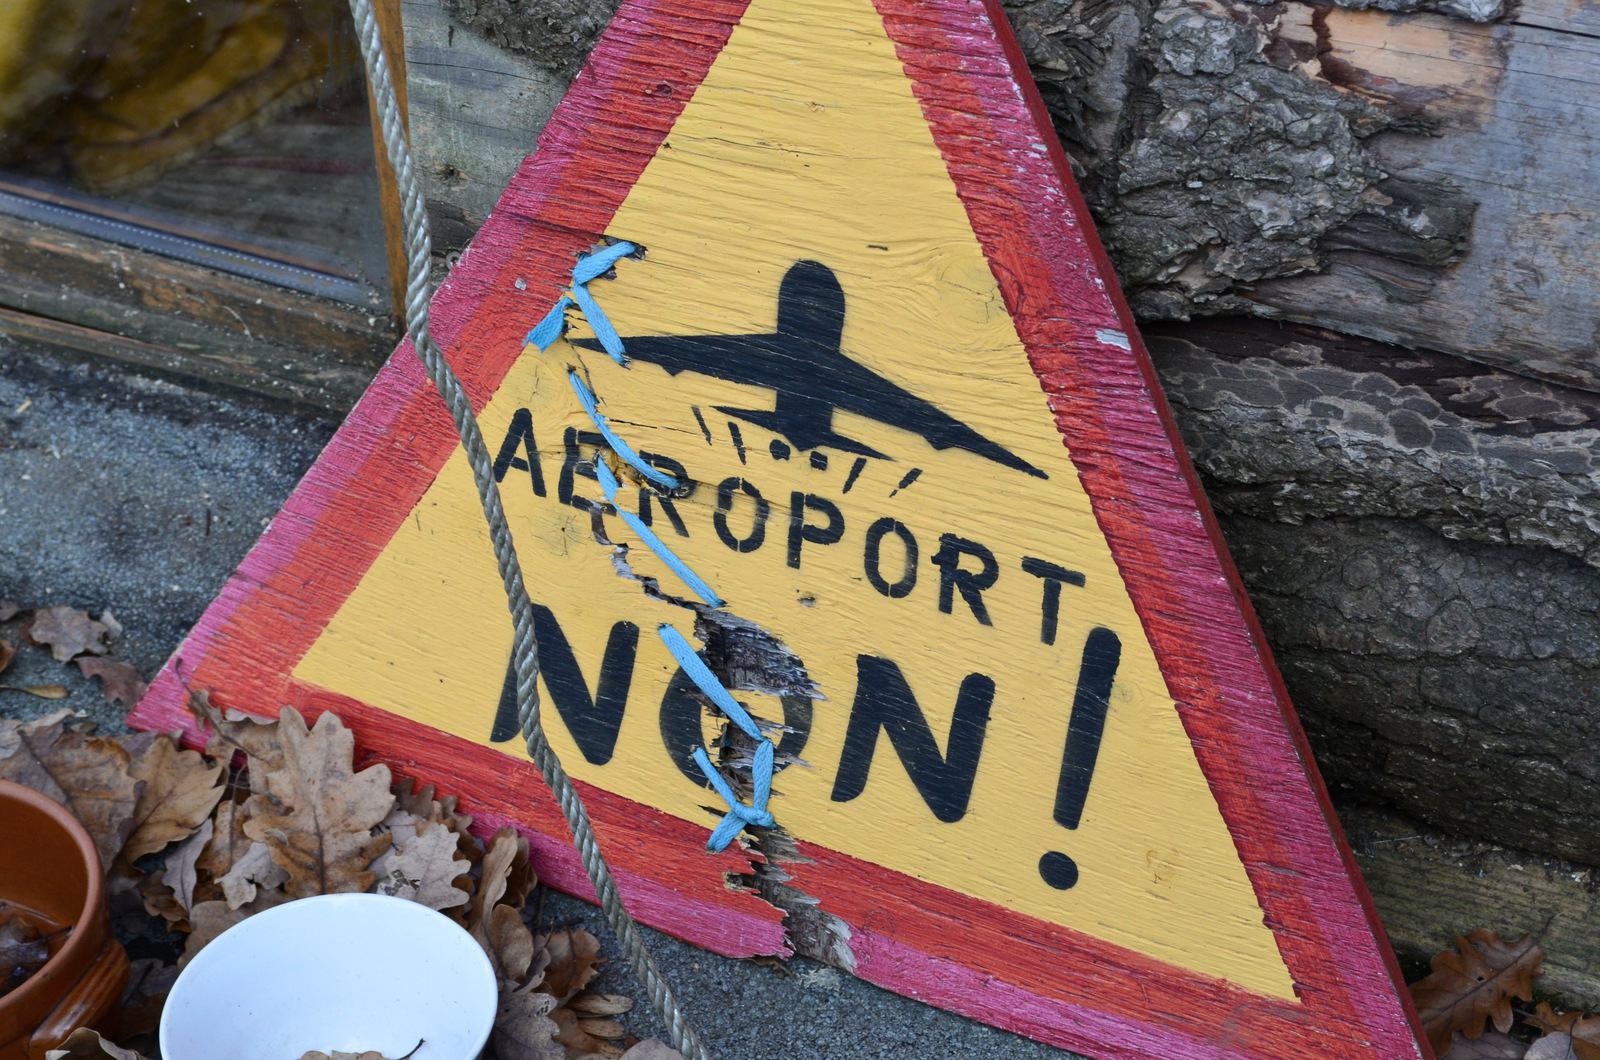 Aeroport non !